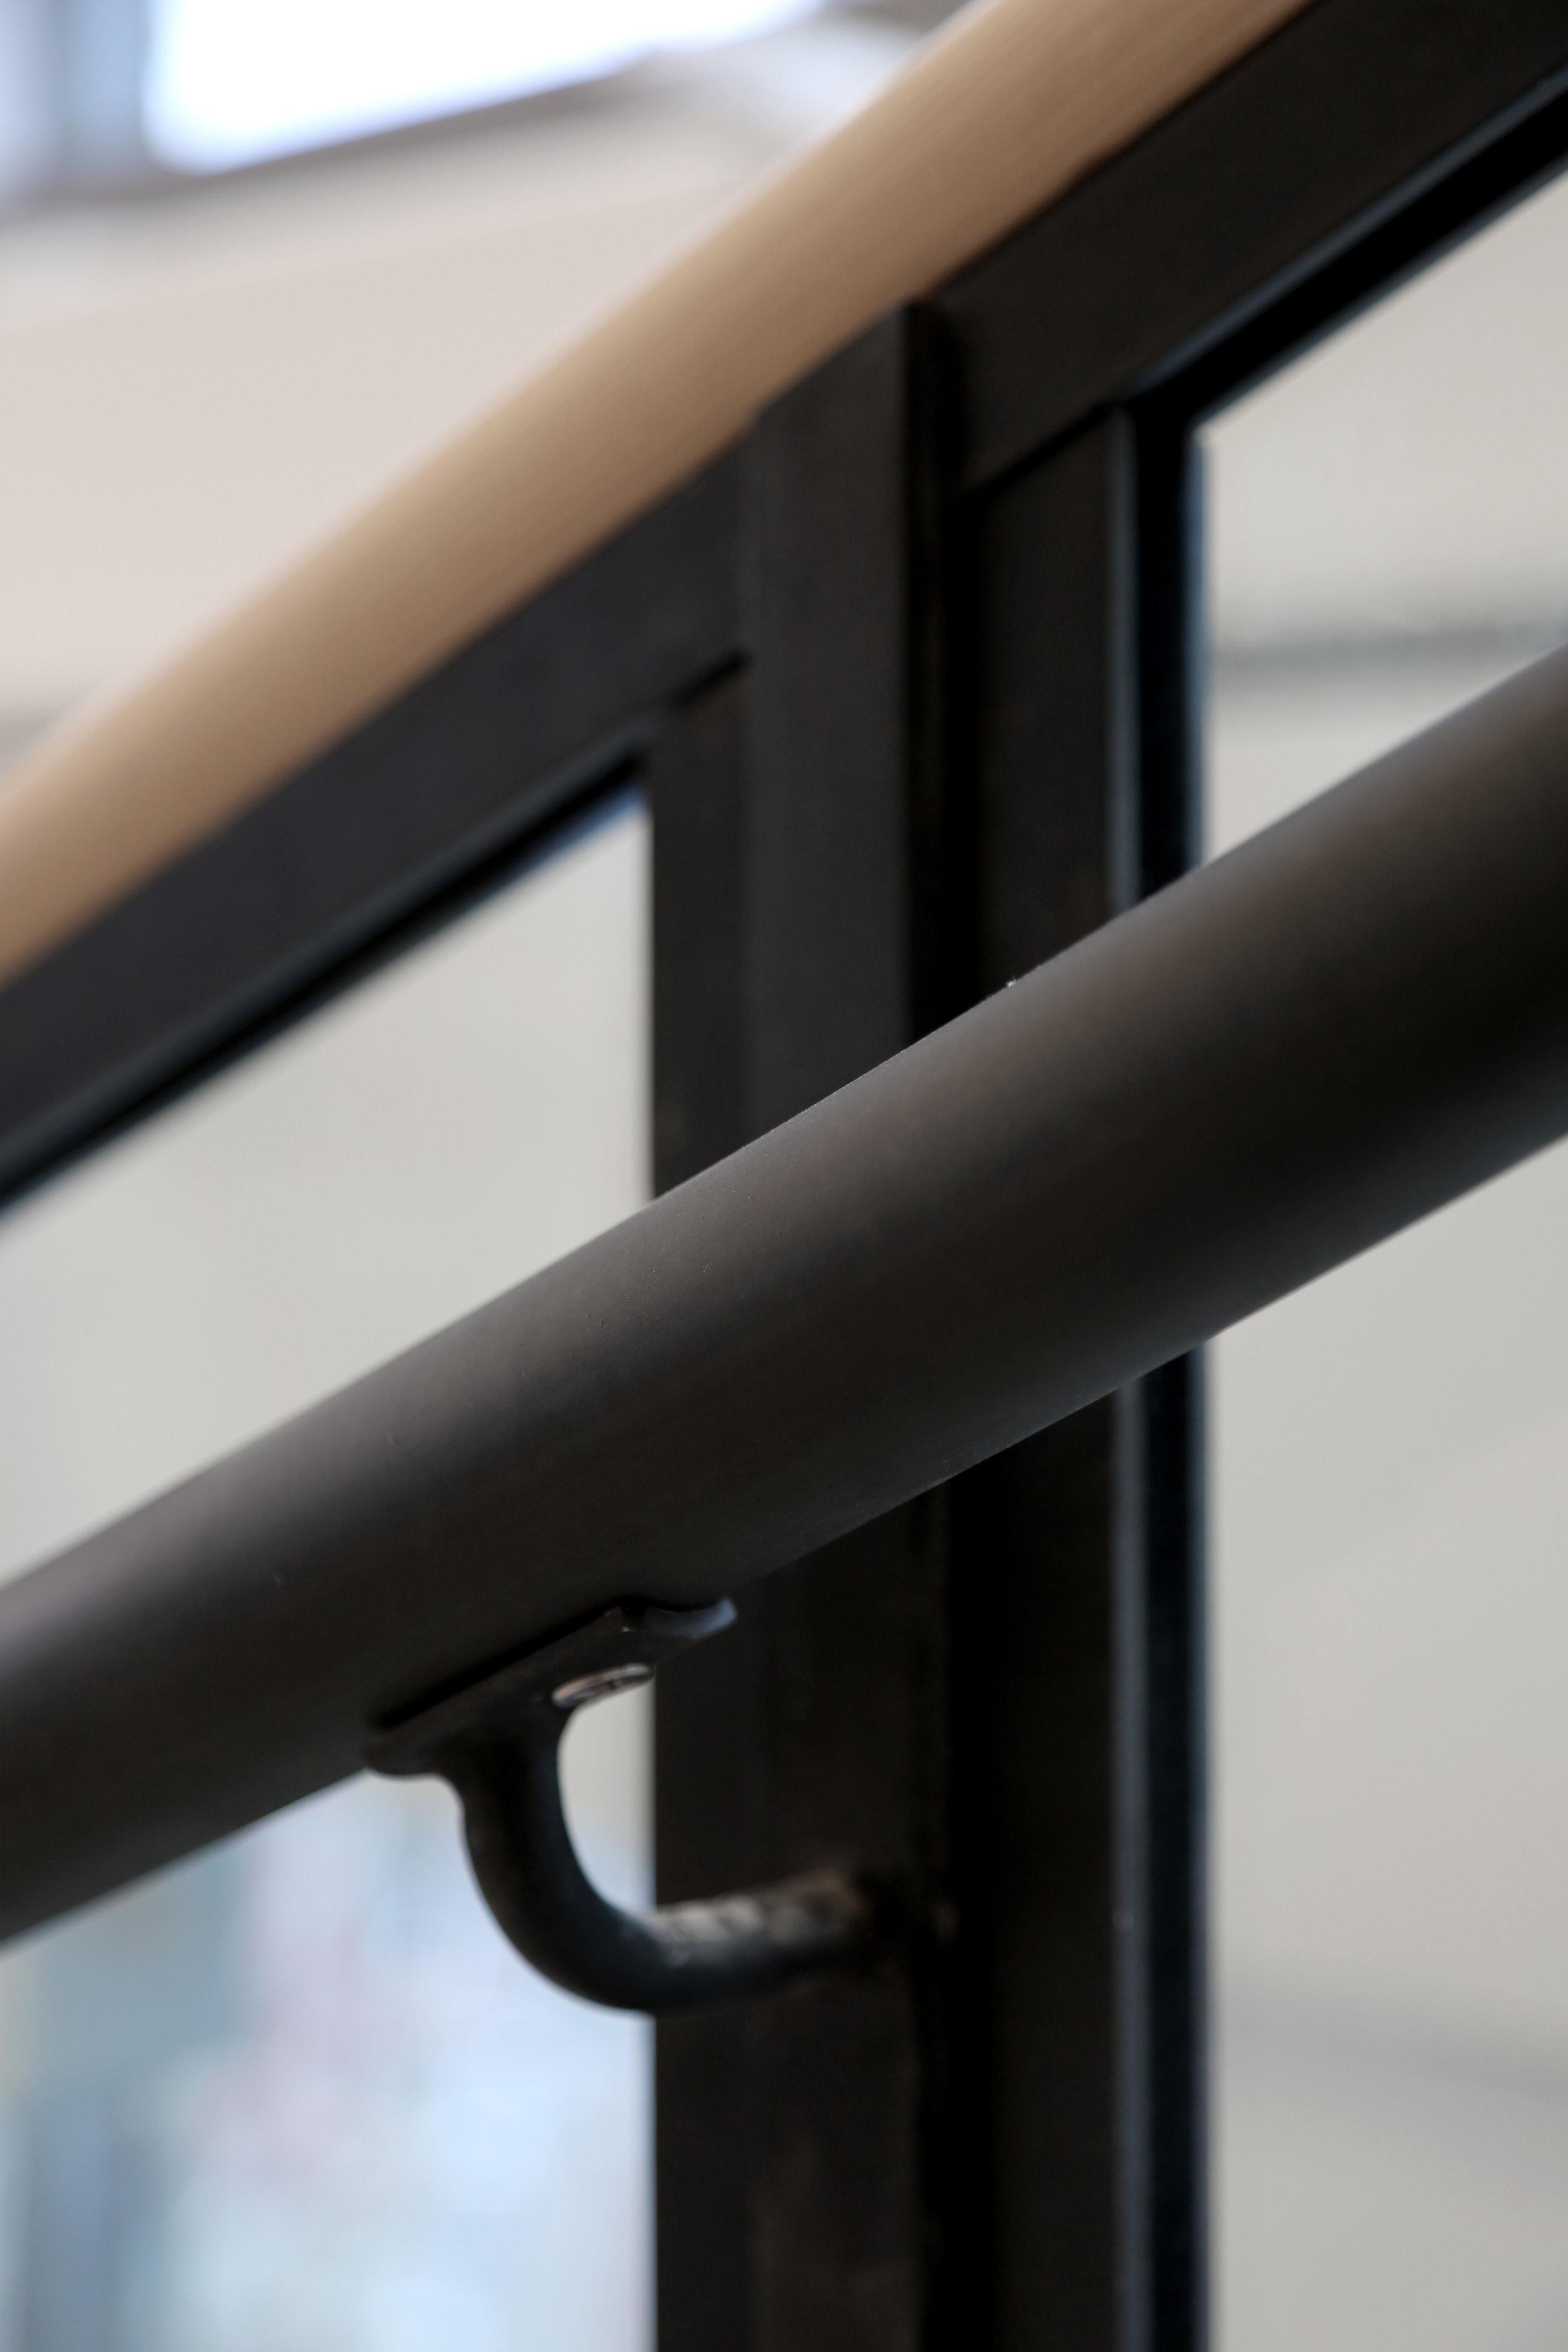 Weathered Black Steel Handrail Glass Staircase Detail - Spaceworks AI.jpg